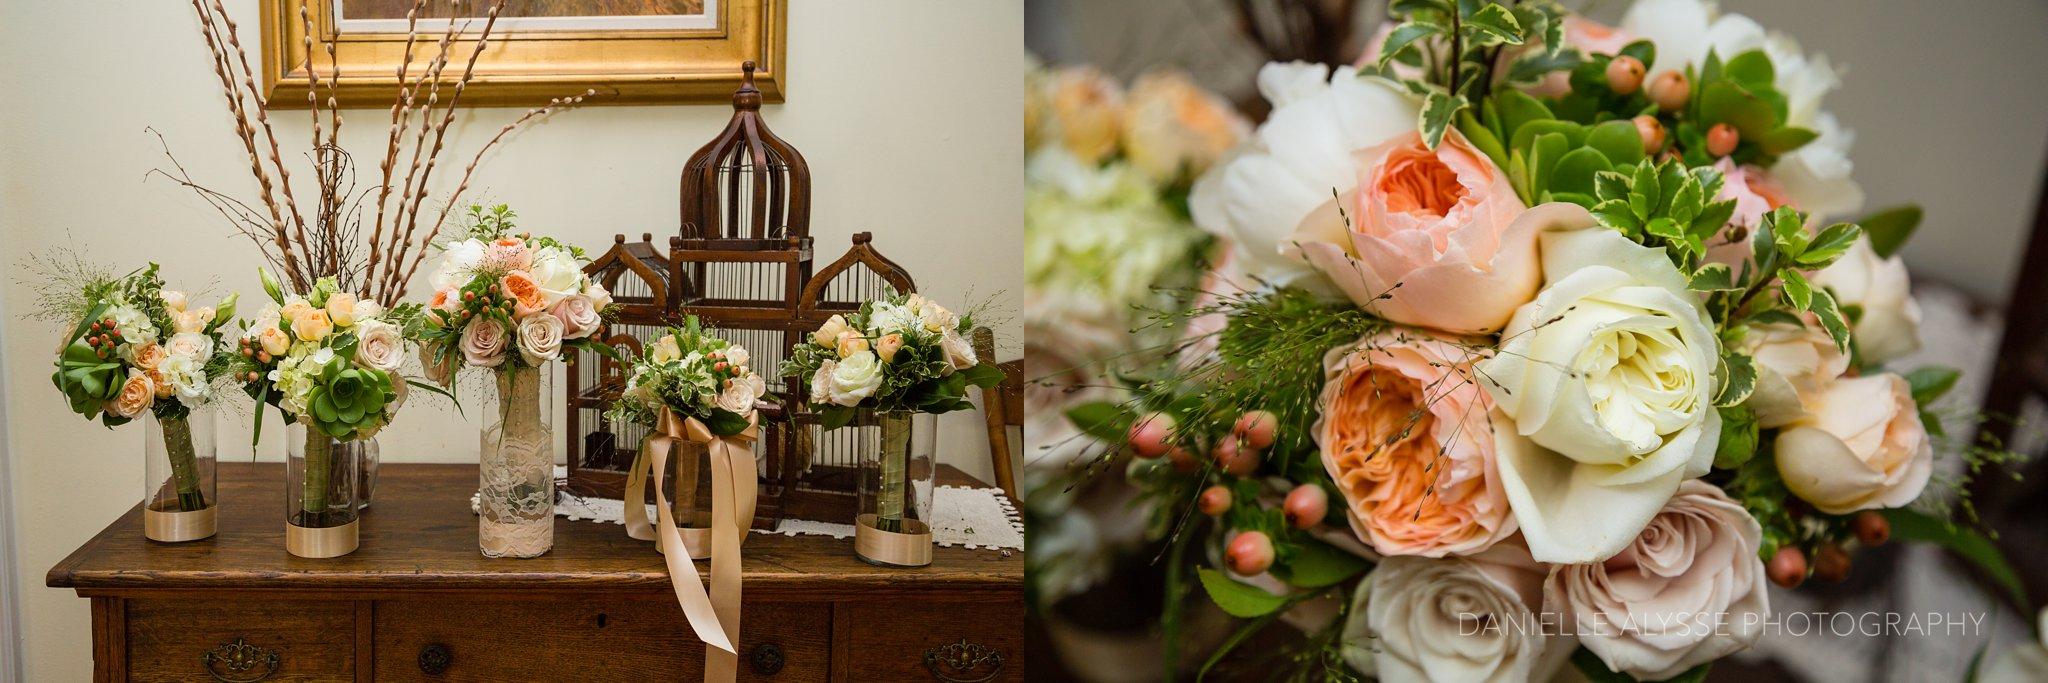 170507_blog_megan_david_wedding_loomis_flower_farm_inn_danielle_alysse_photography_sacramento_photographer0053_WEB.jpg